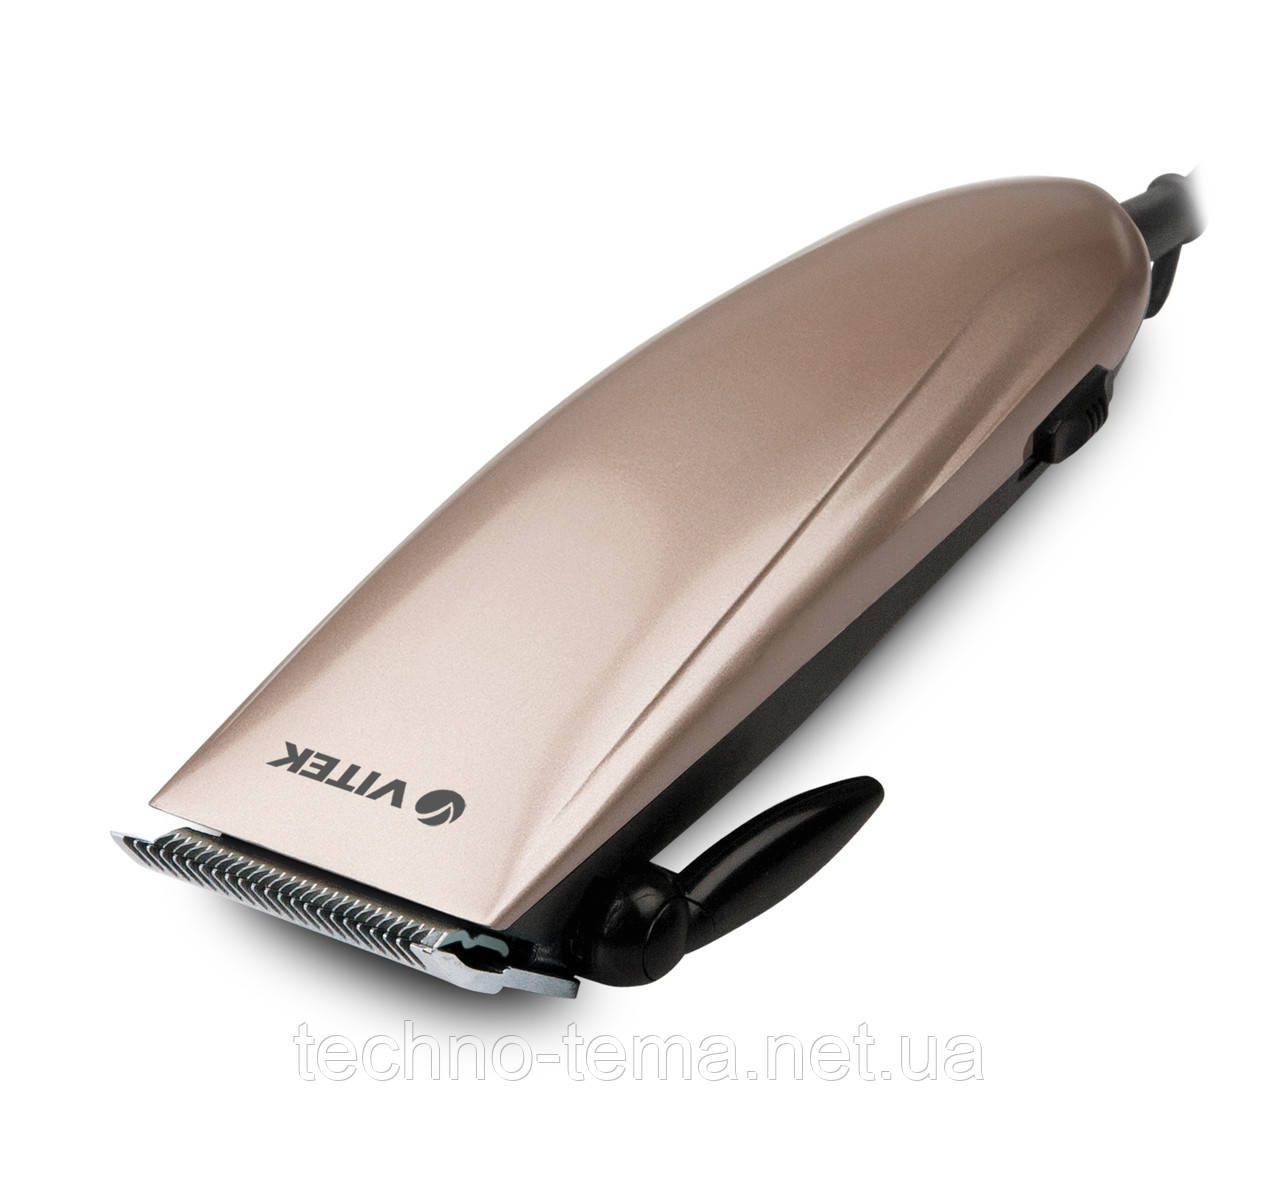 Машинка для стрижки волос VITEK VT 1354